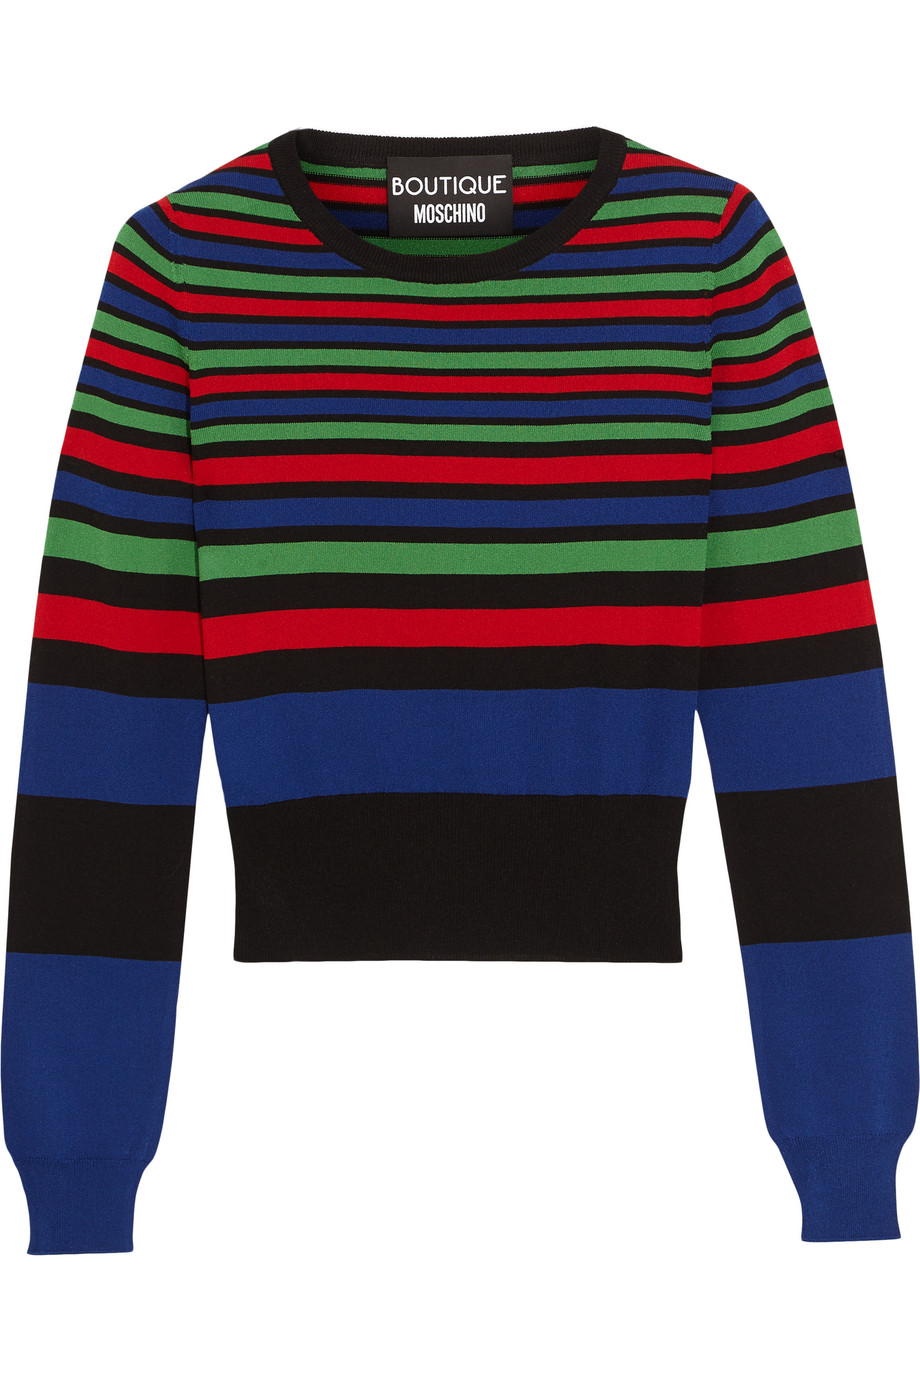 Striped Stretch-Knit Sweater, Royal Blue, Women's, Size: 38